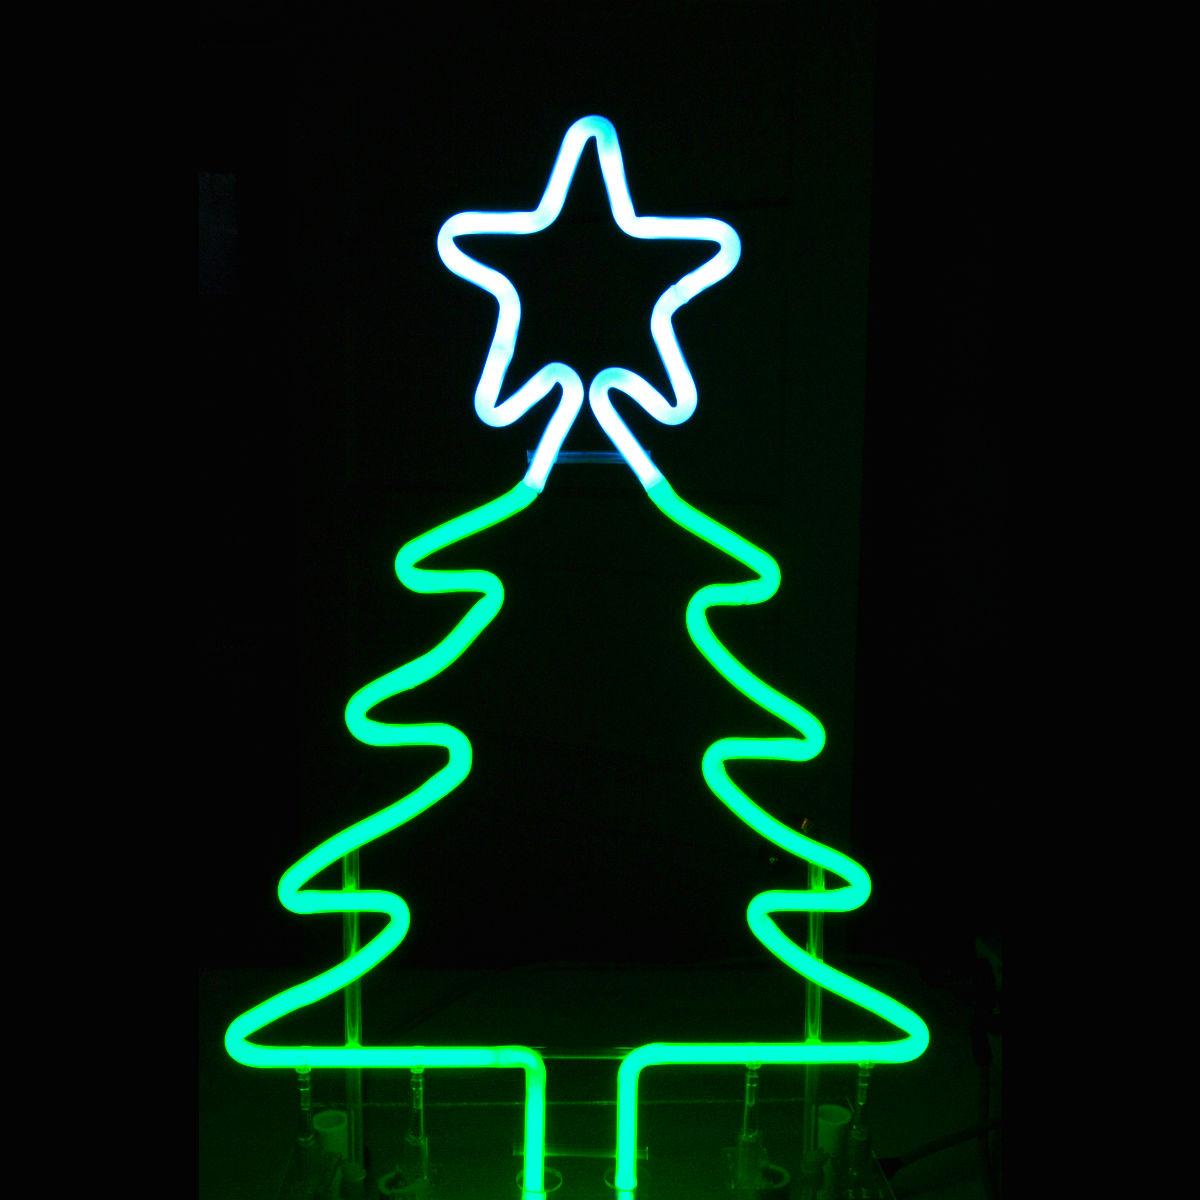 Magical Luminous Neon Christmas Tree!